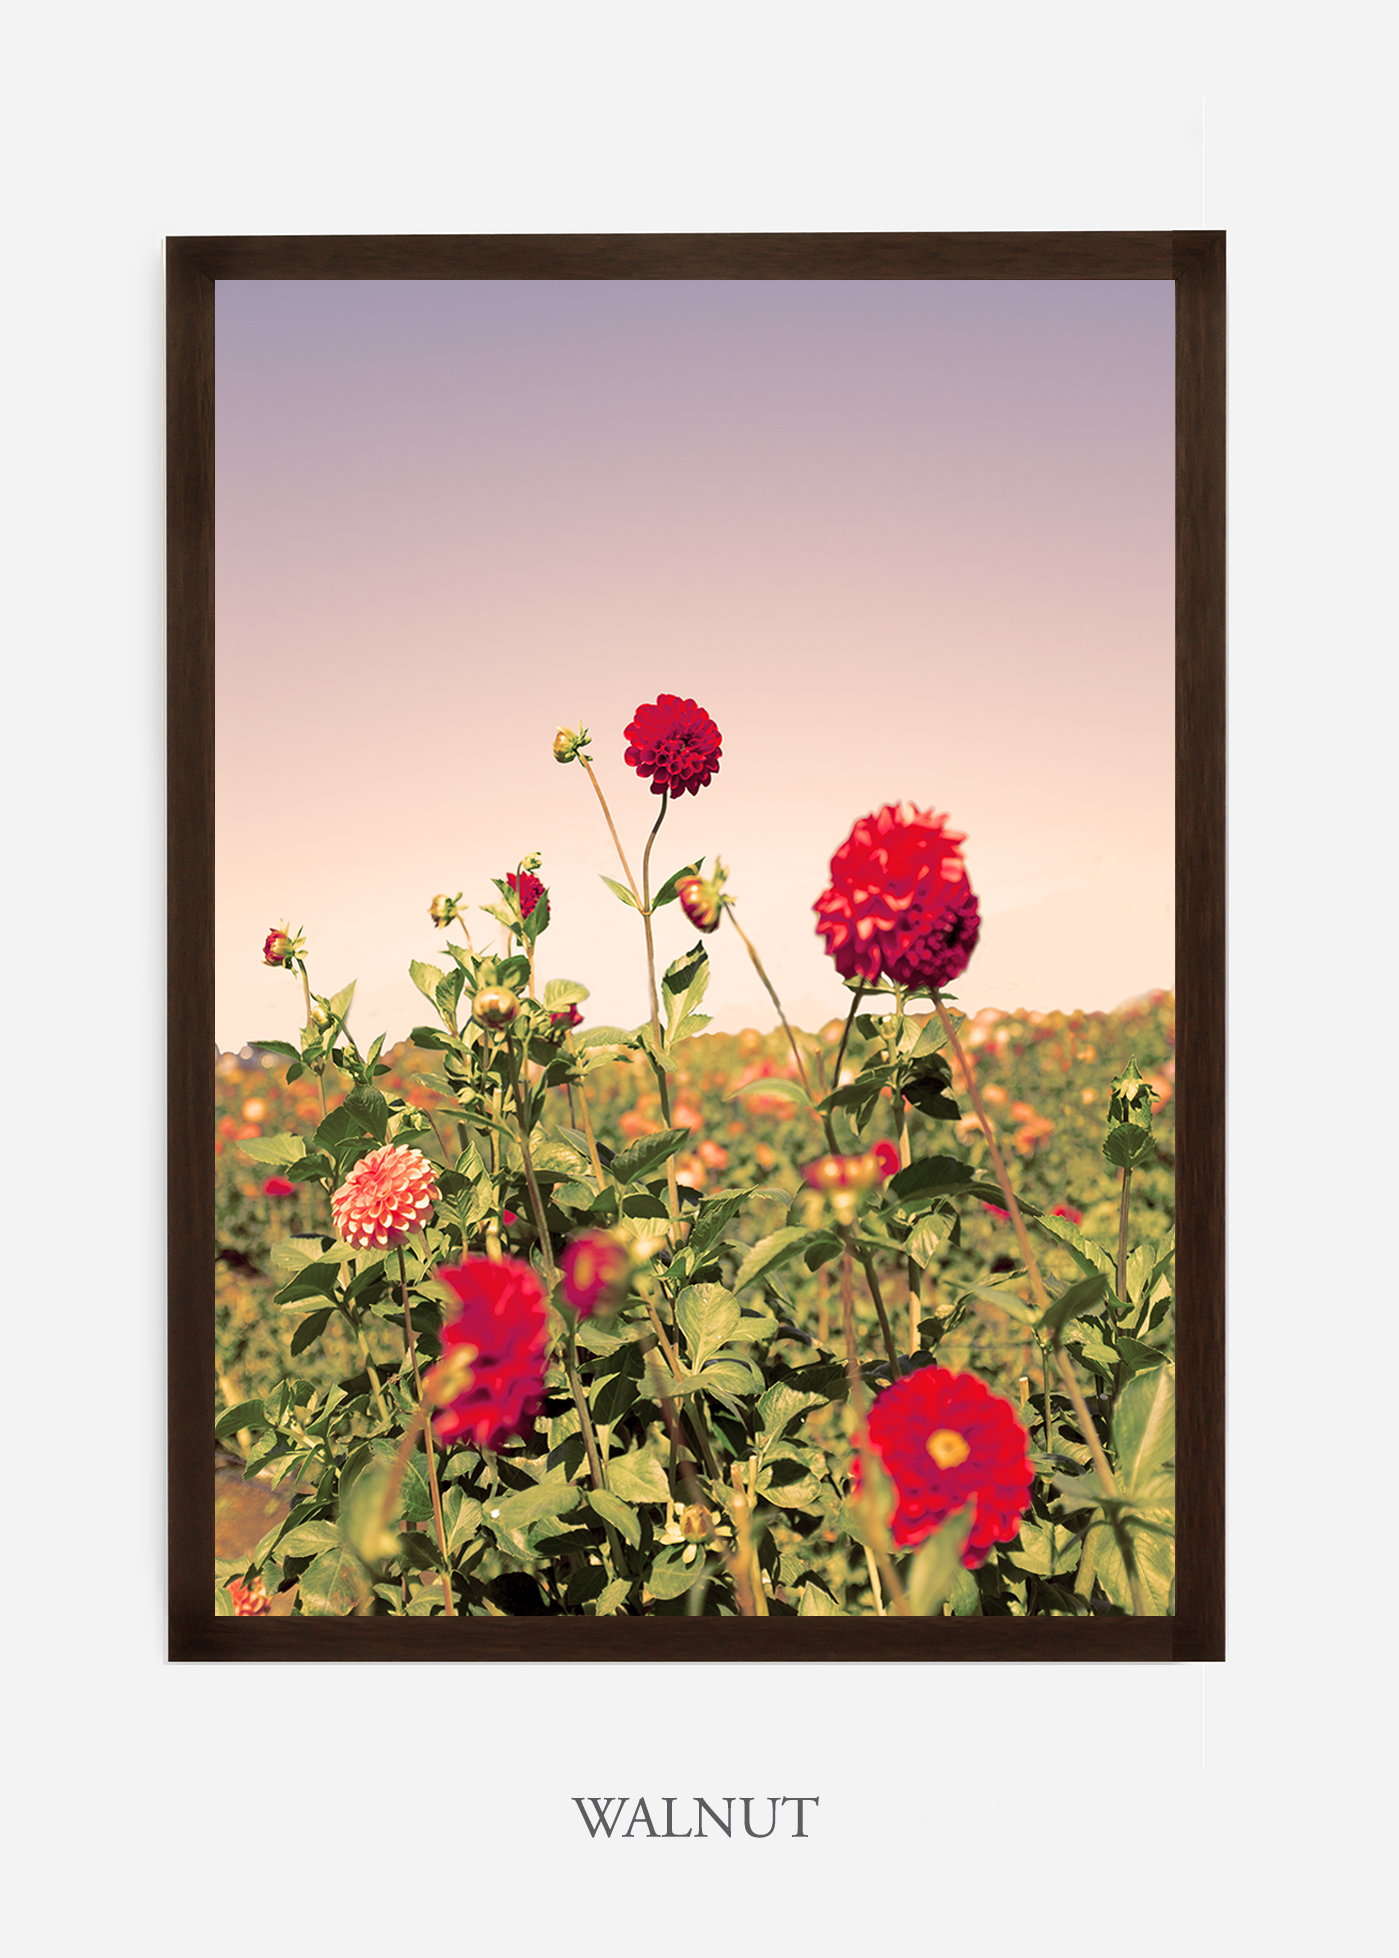 DahliaNo.8-walnut-frame-interior-design-botanical-print-art-wilder-california-wilder-paper.jpg